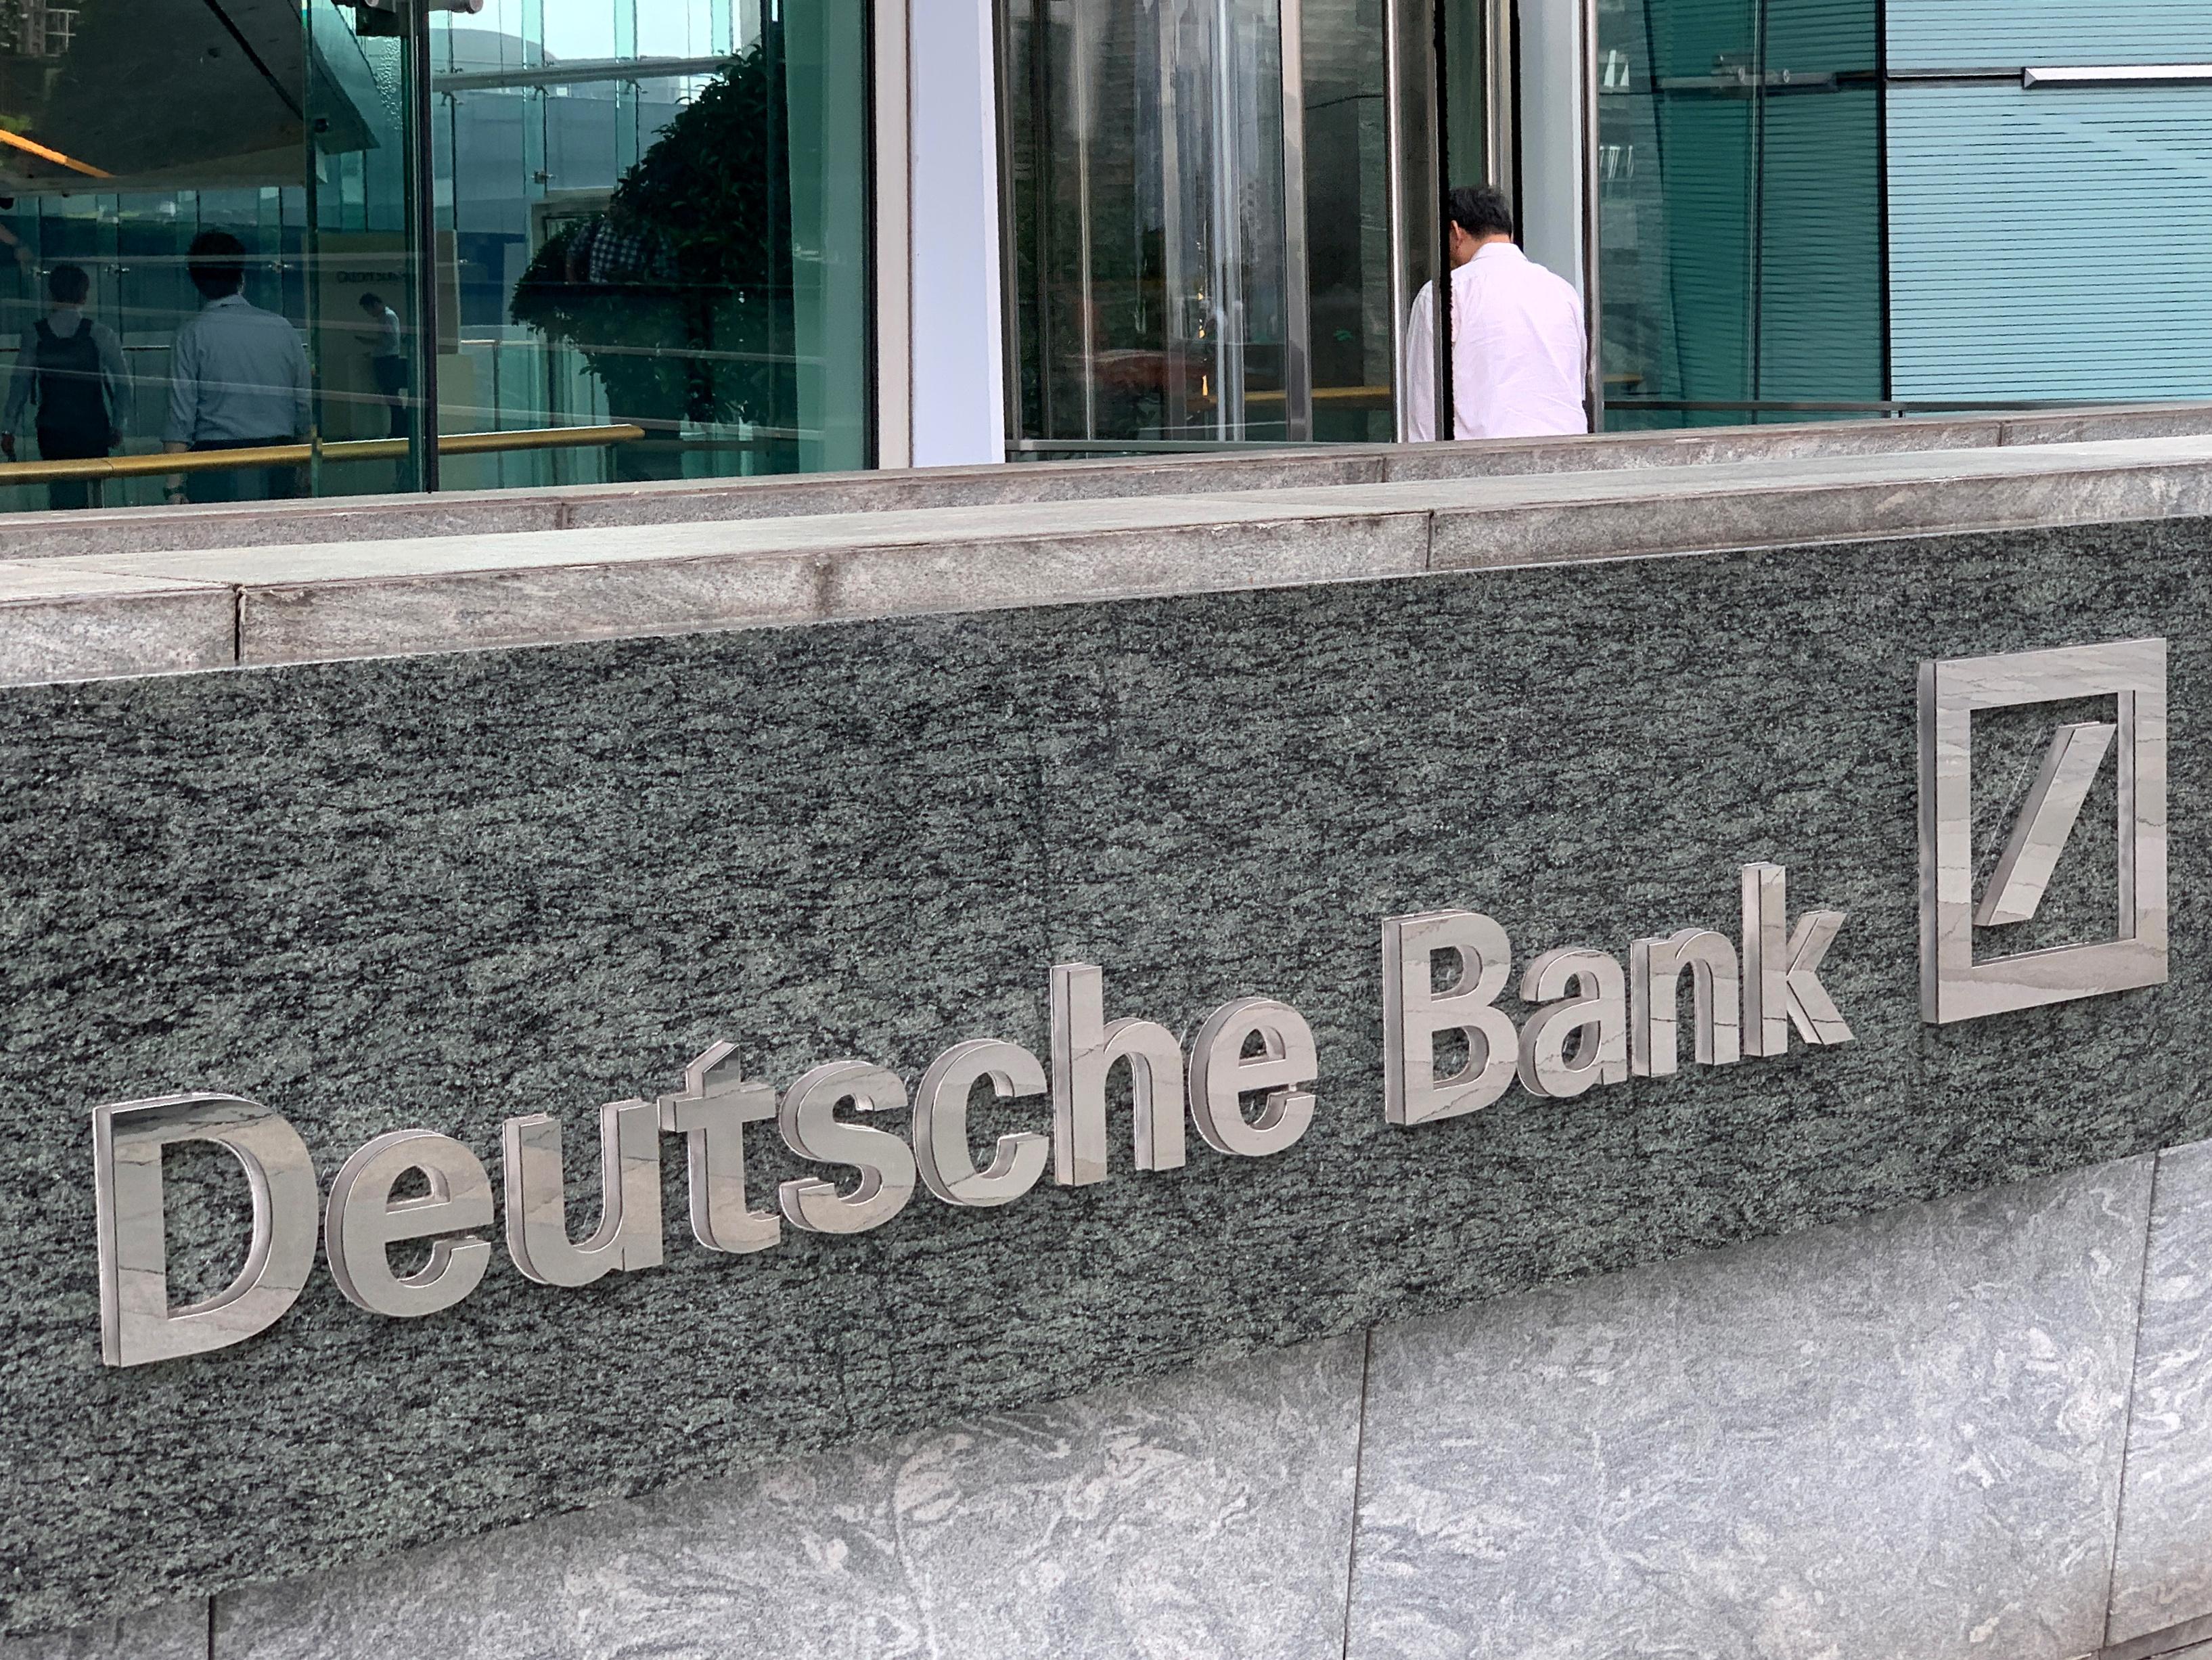 The logo of Deutsche bank is seen in Hong Kong, China July 8, 2019. REUTERS/Tyrone Siu/Files